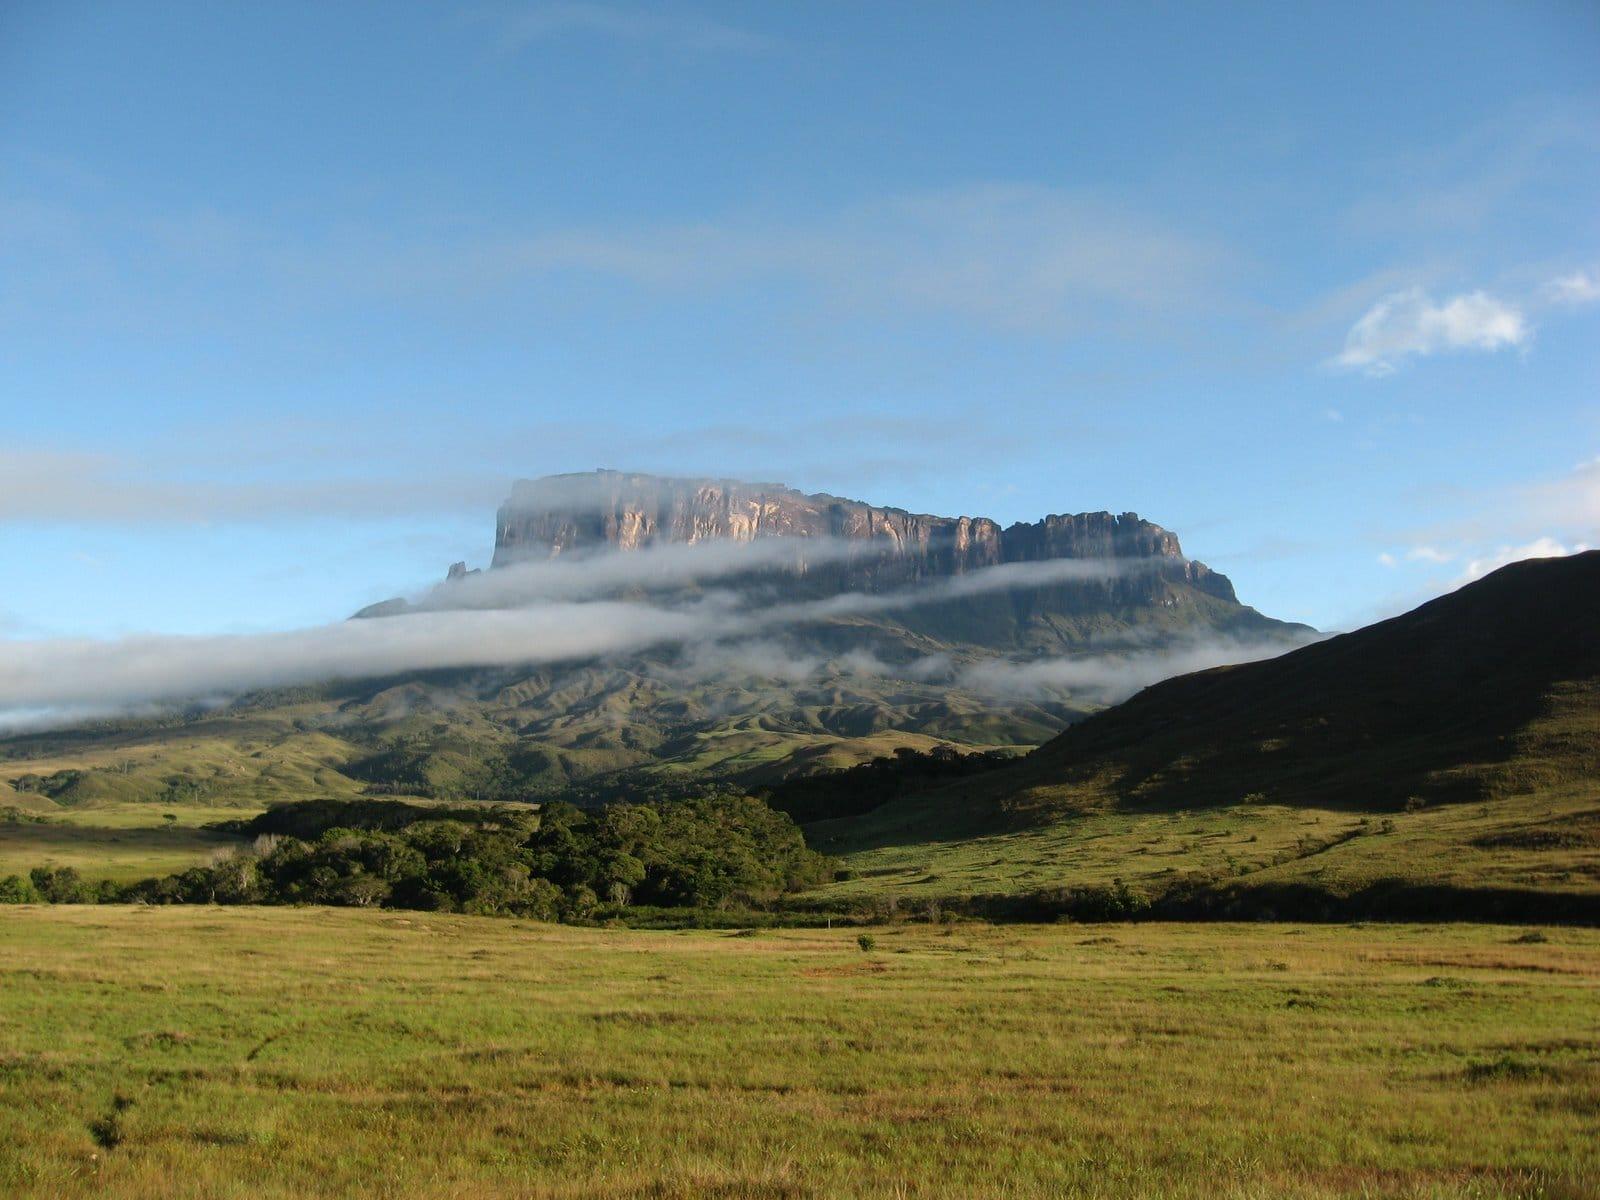 Muntele Roraima schimbă orizontul lumii